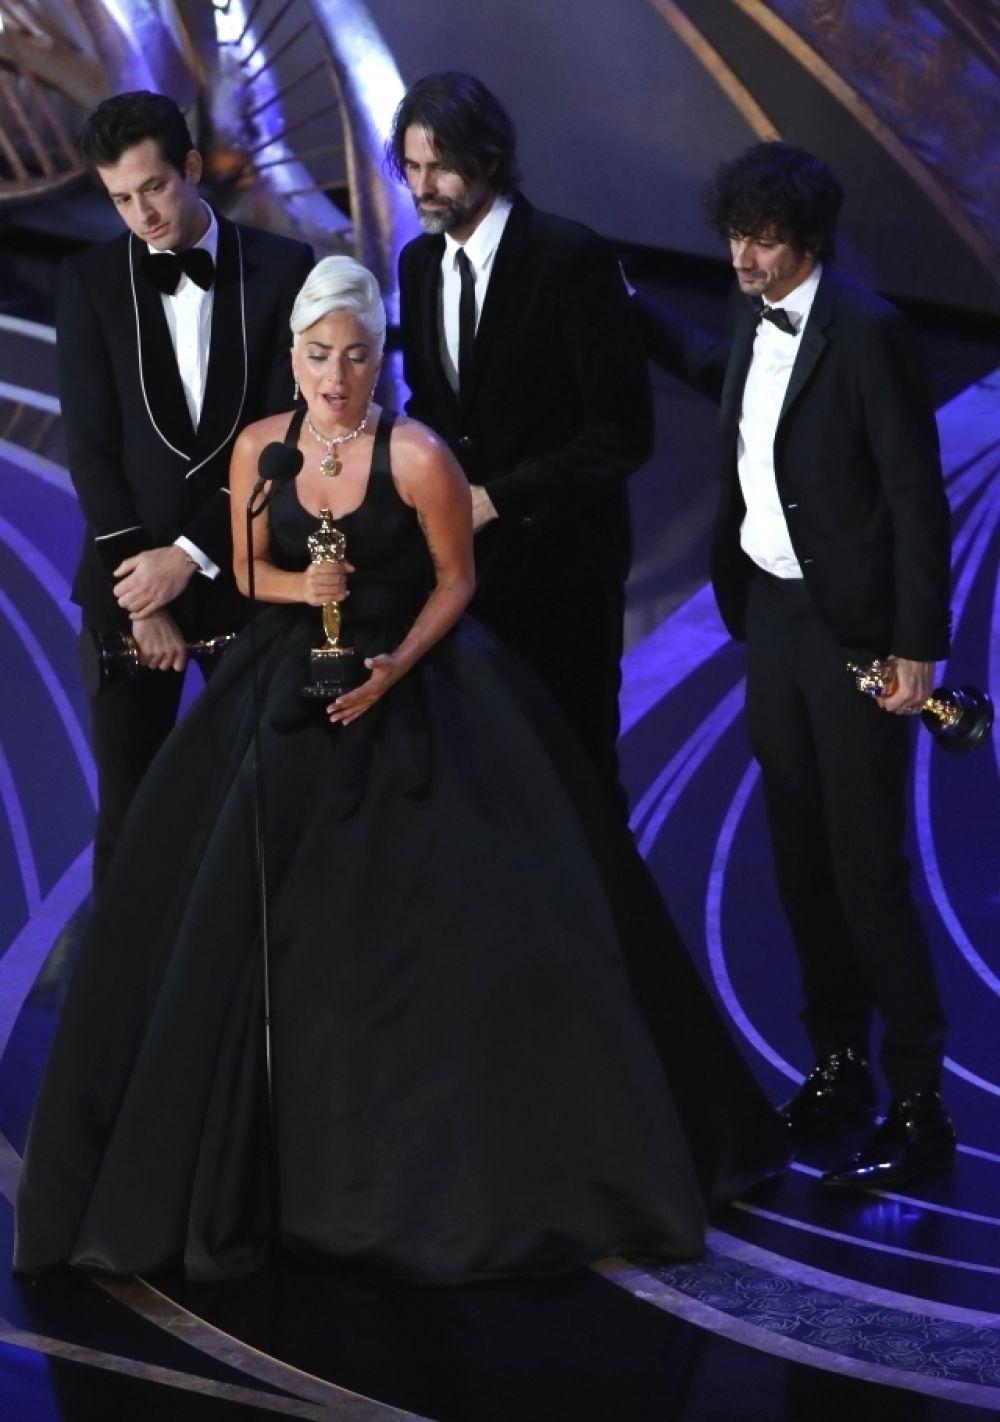 Леди Гага получила «Оскар» за композицию «Shallow» из фильма «Звезда родилась».